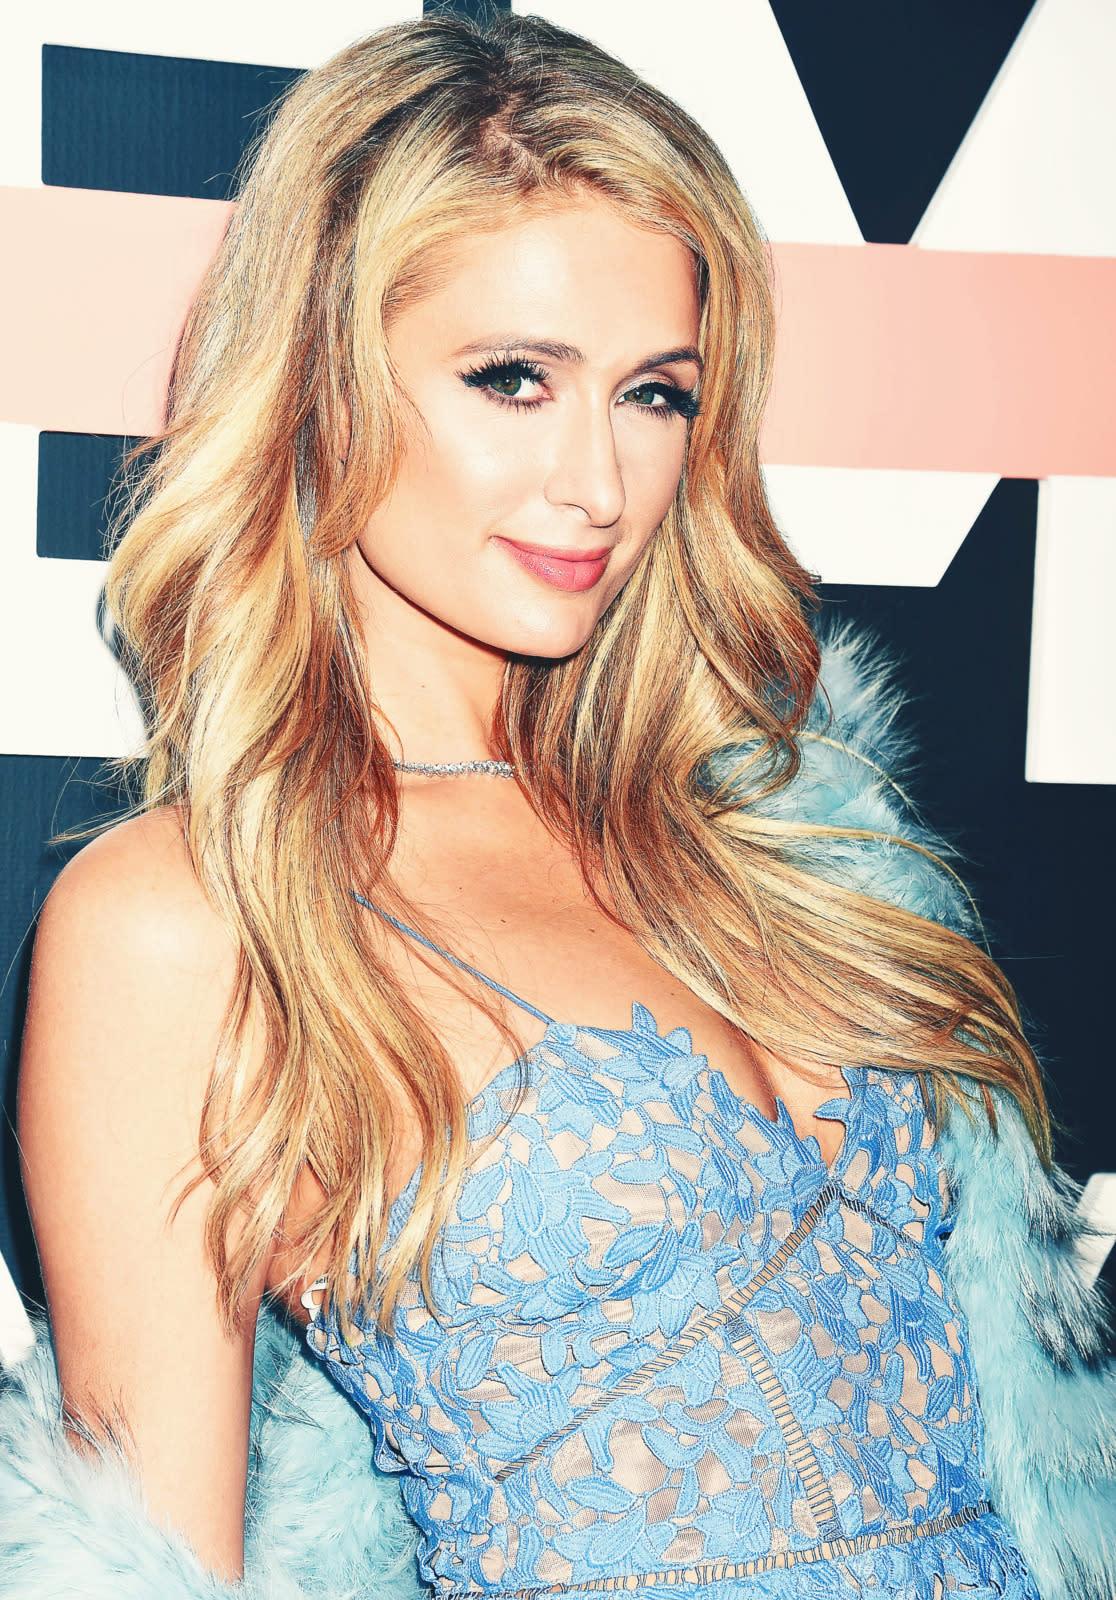 The New Paris Hilton Has 23 Perfumes, Goes to Clubs for Work Paris Hilton